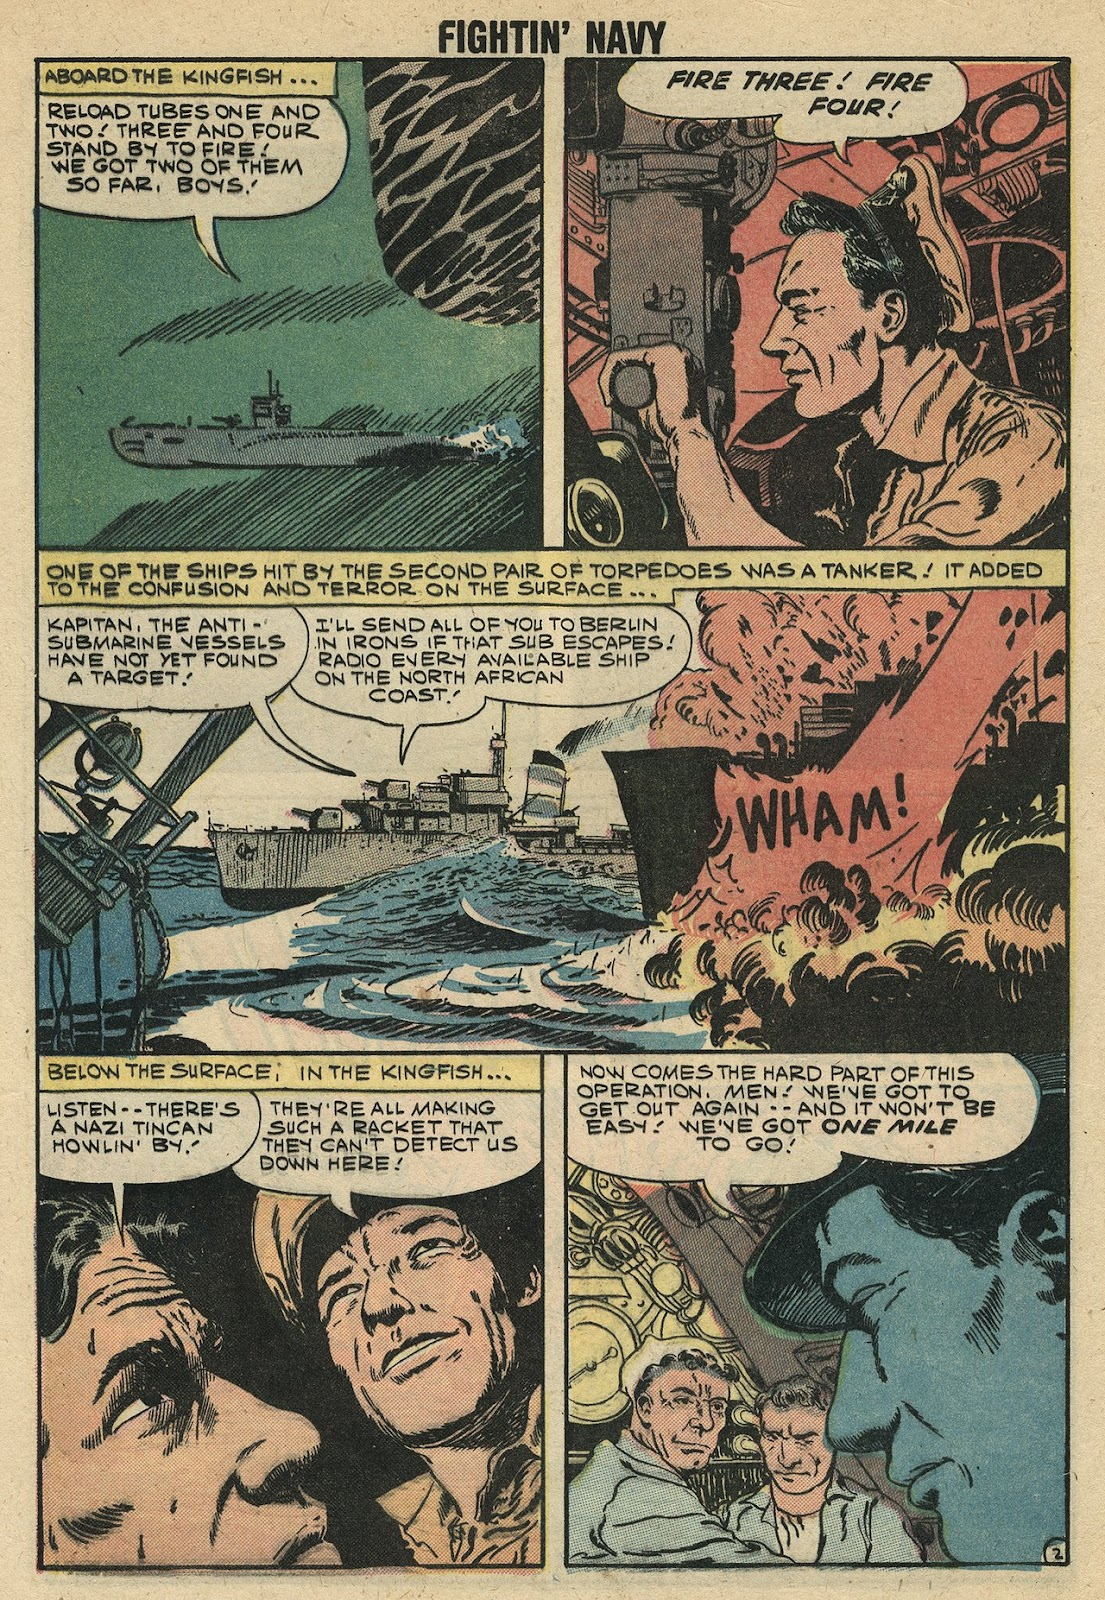 Read online Fightin' Navy comic -  Issue #86 - 4